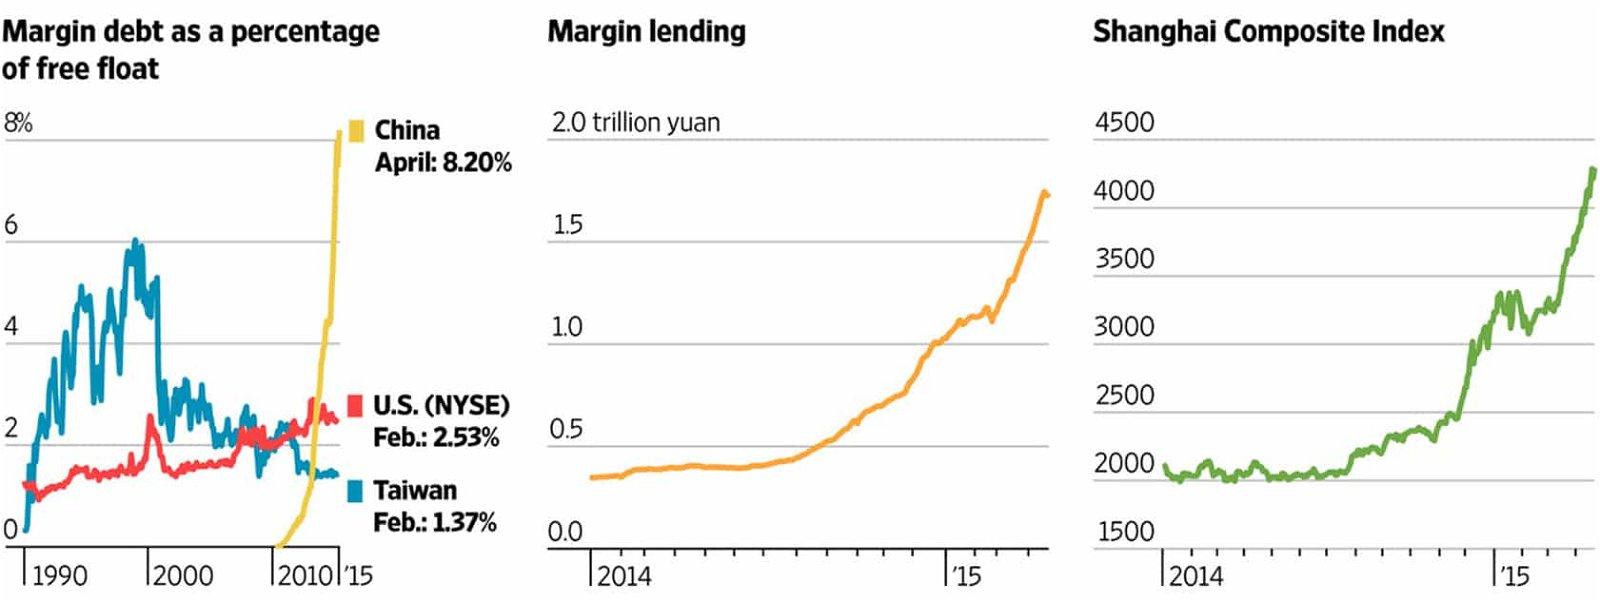 Margin Debt / Margin Lending / Shanghai Composite Index